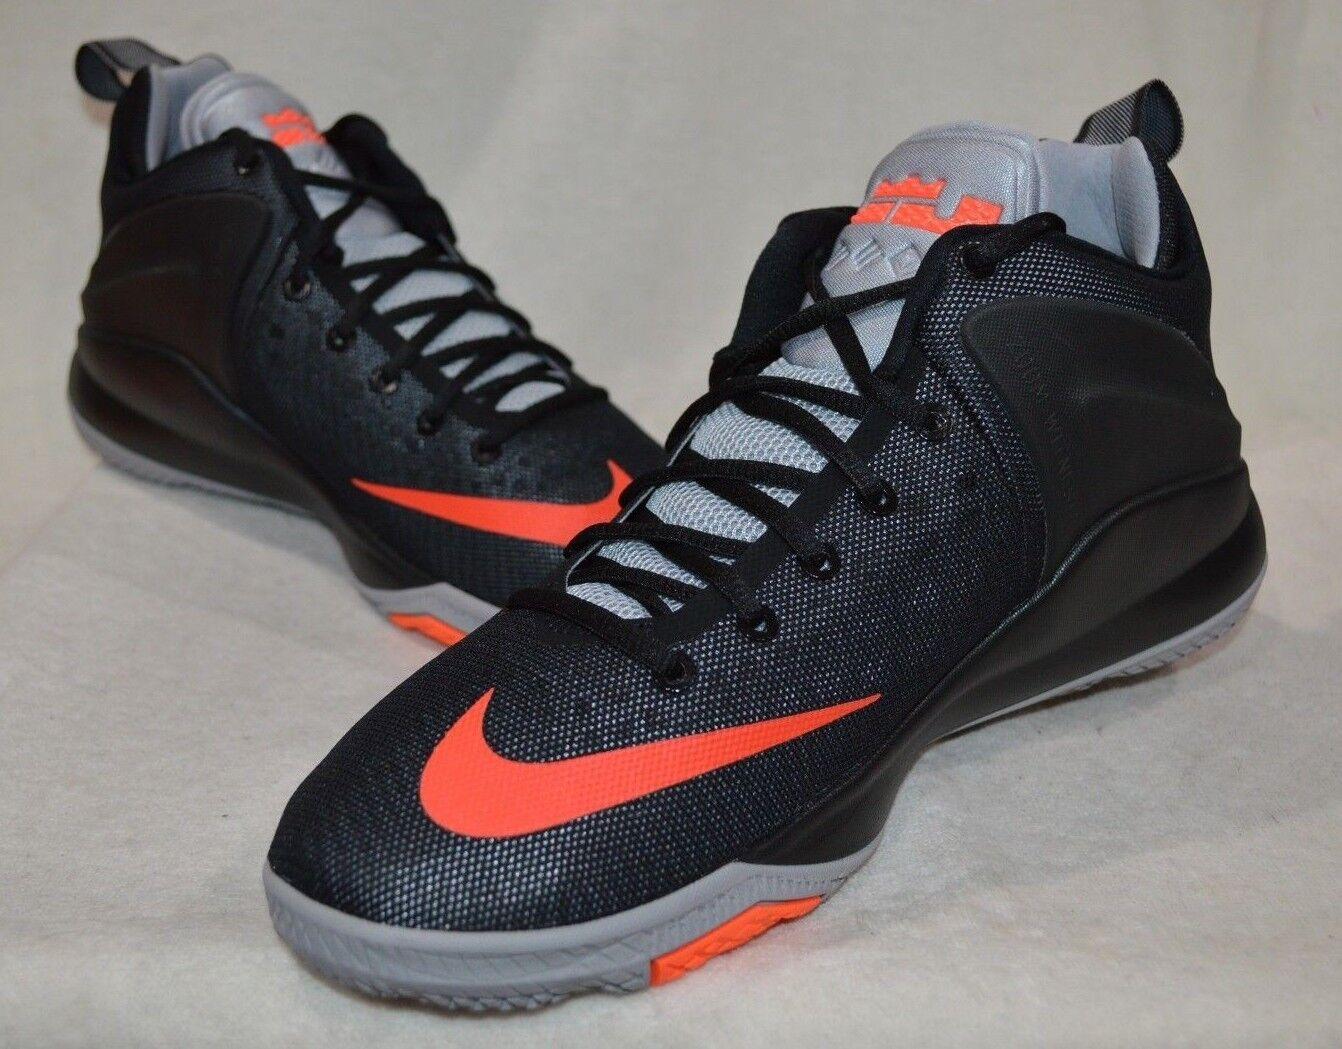 Nike LeBron Zoom Witness Black Crimson Grey Men's Basketball shoes-Asst Size NWB